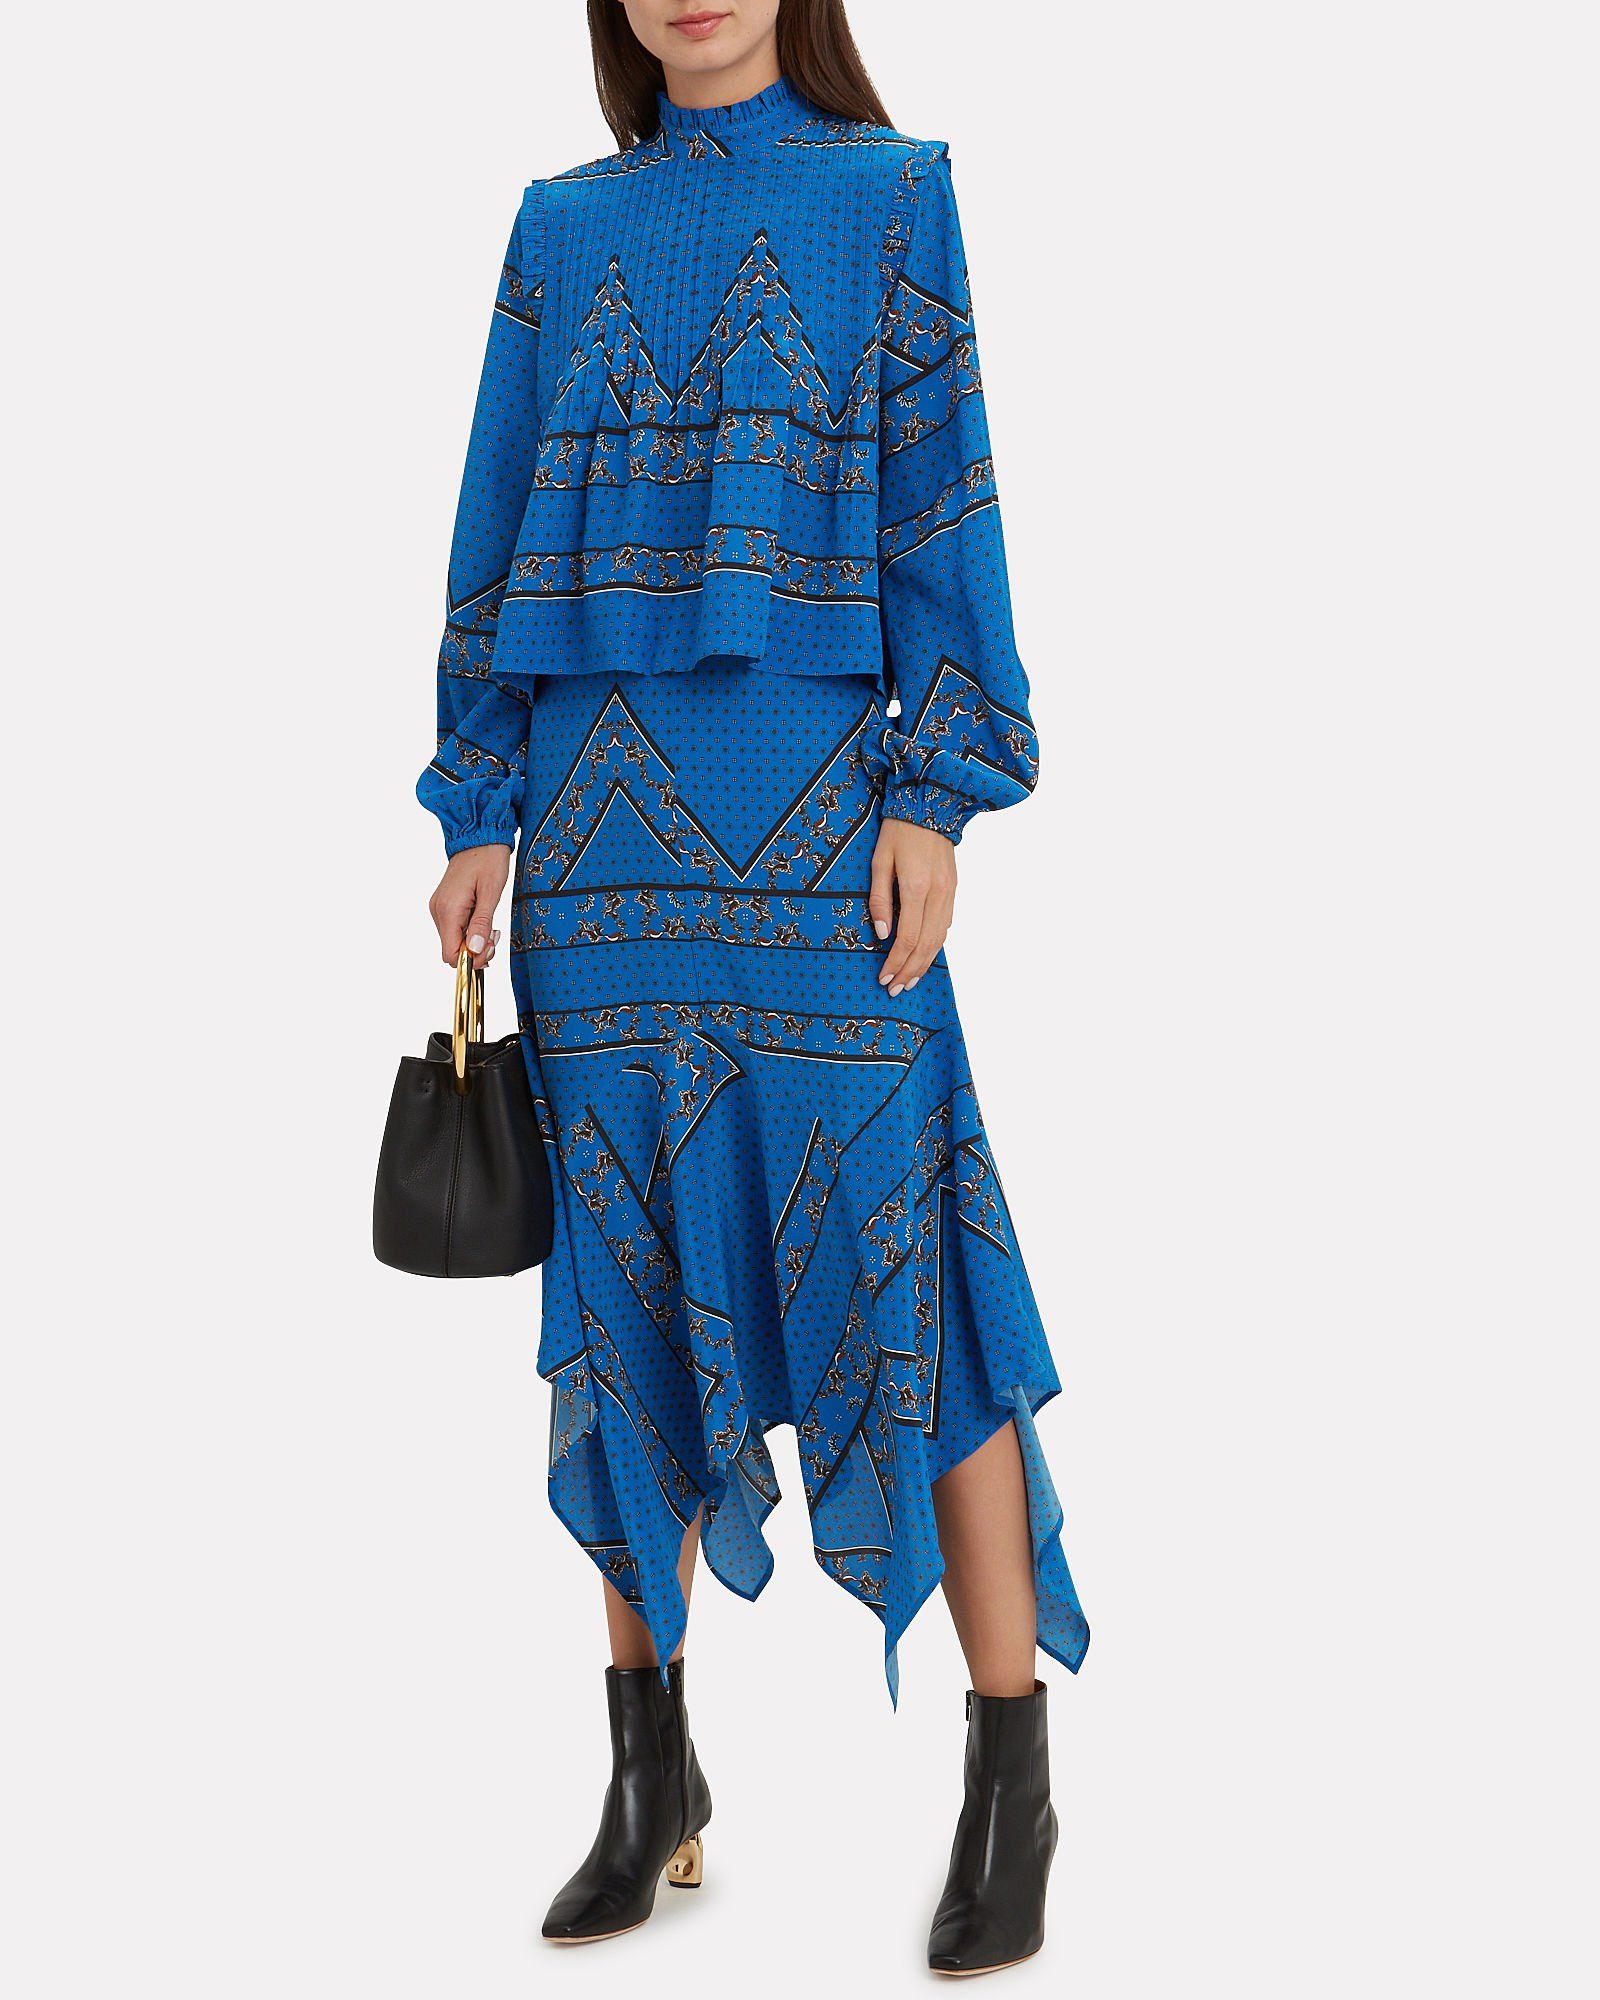 a79871bb6f43 Ganni Sandwashed Silk Printed Lapis Blue Top + Skirt